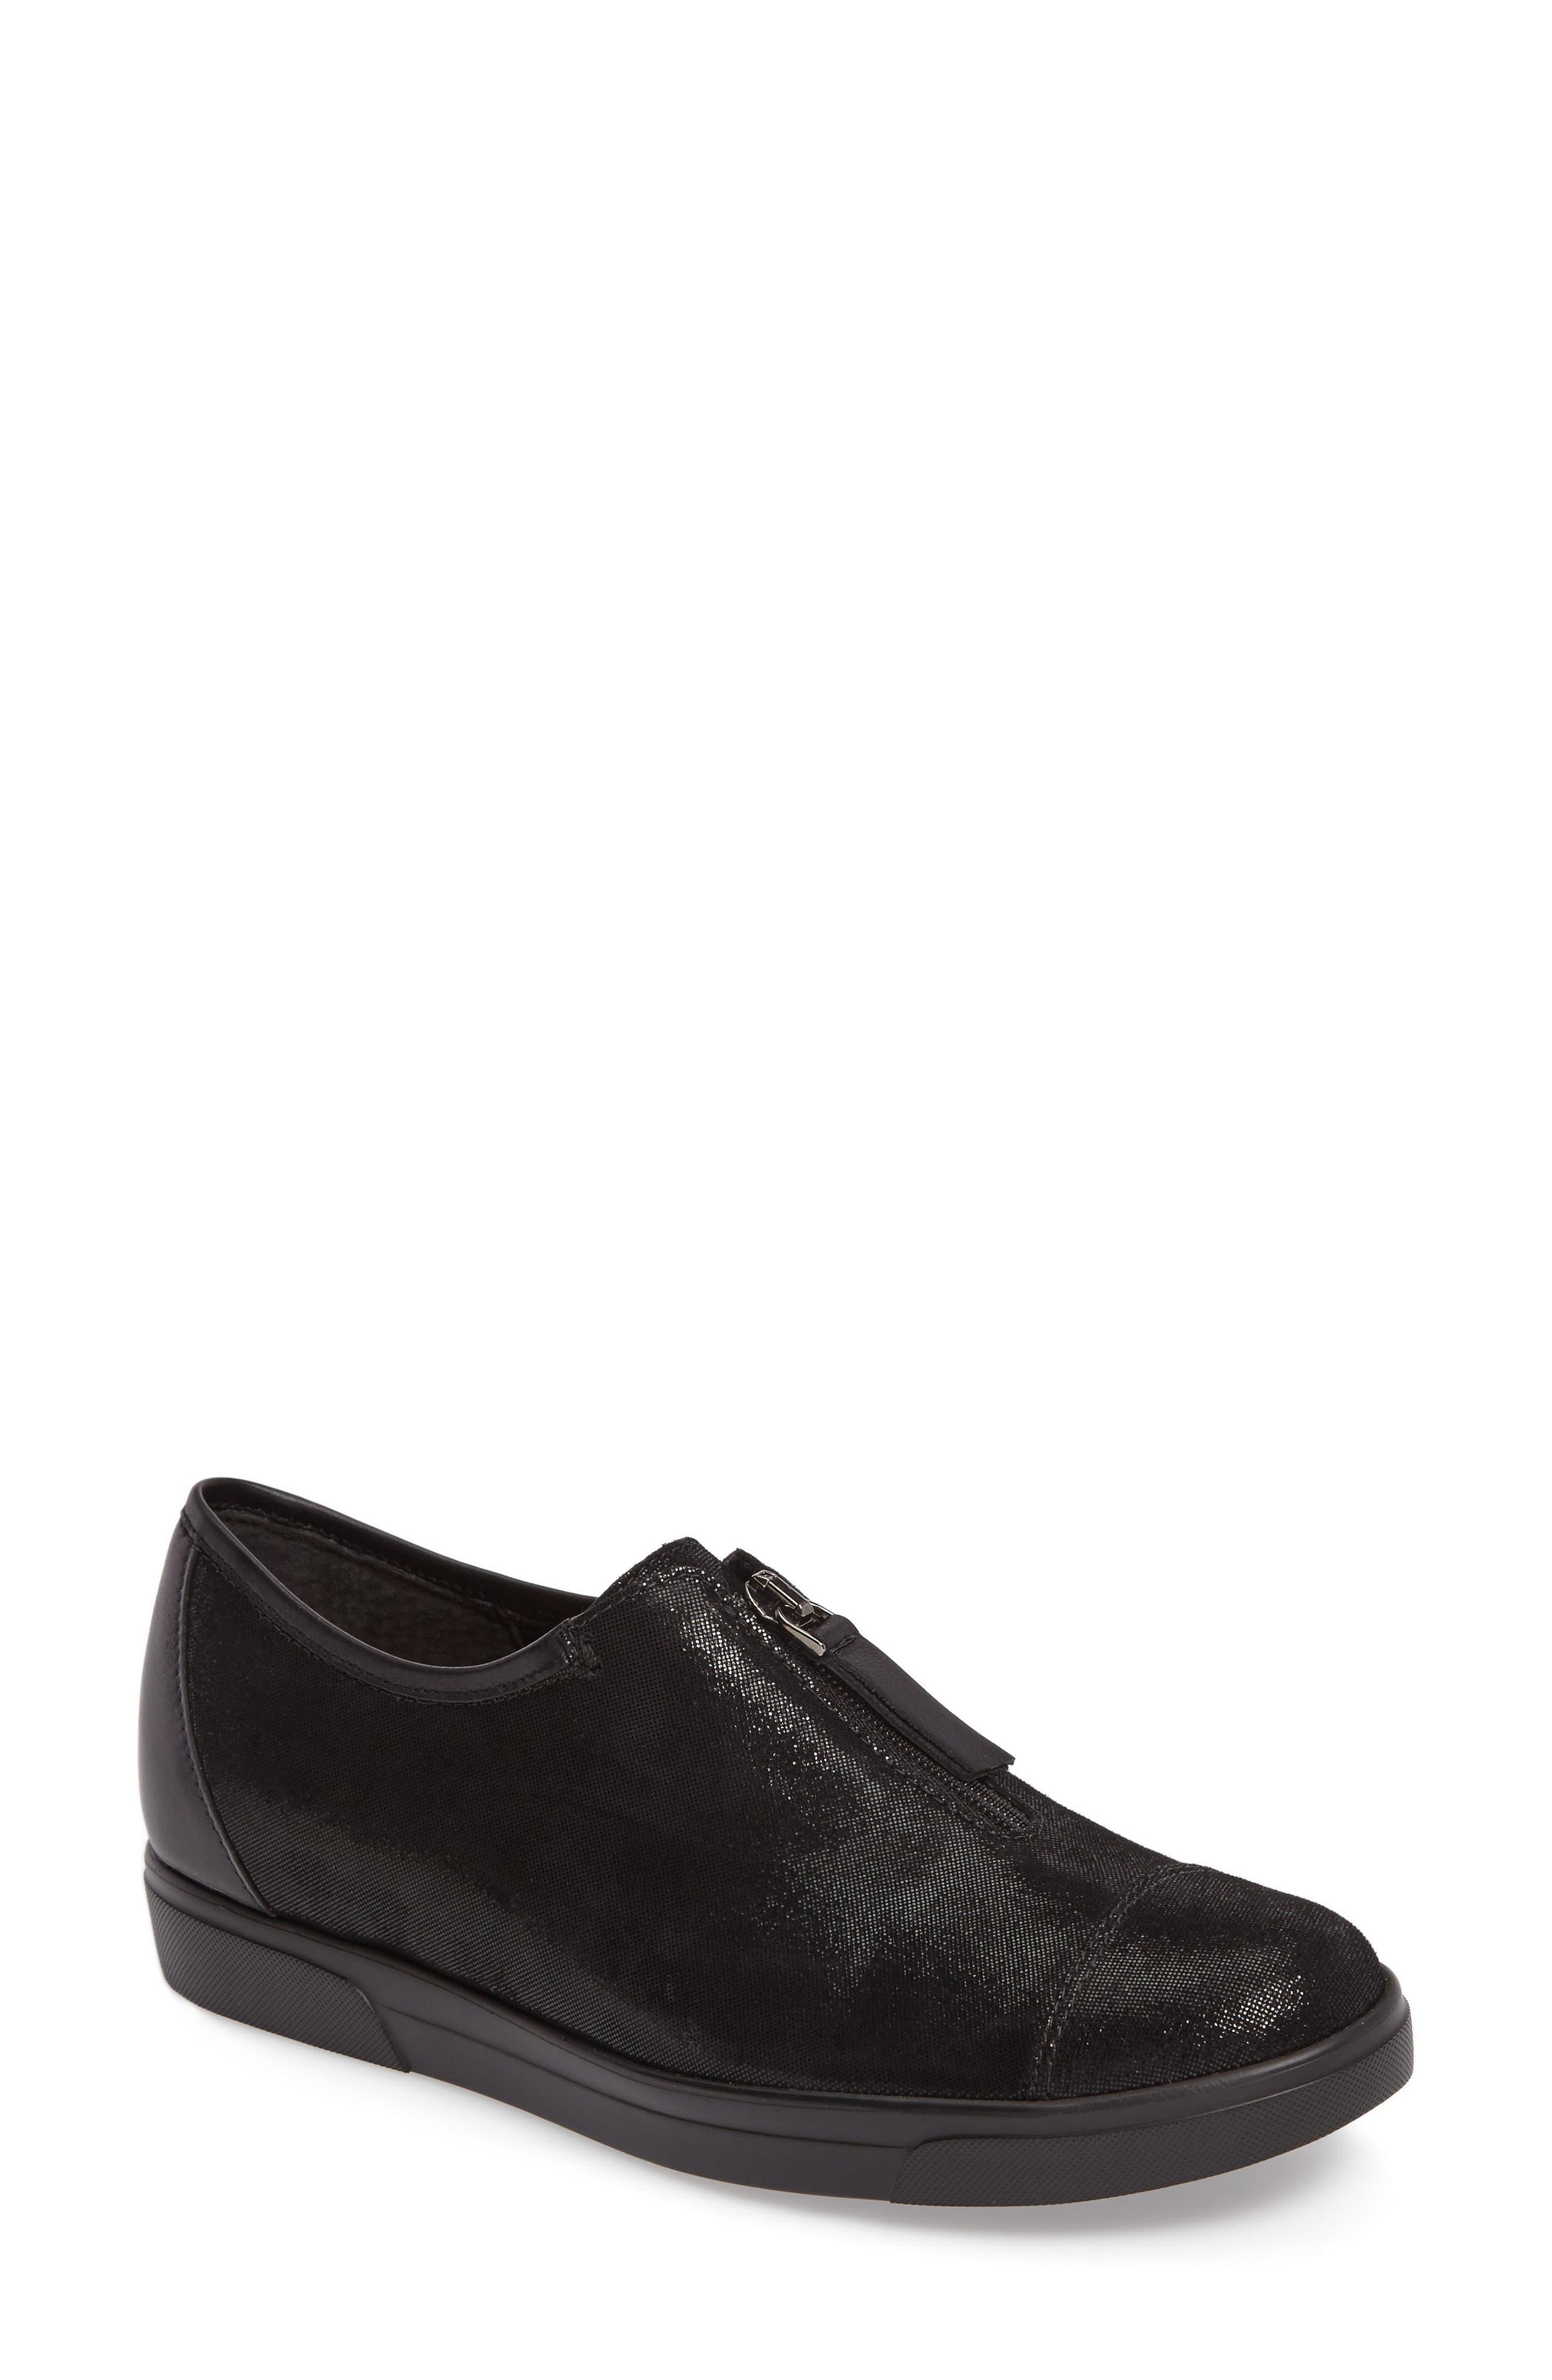 Roslyn Zip Sneaker,                             Main thumbnail 1, color,                             001